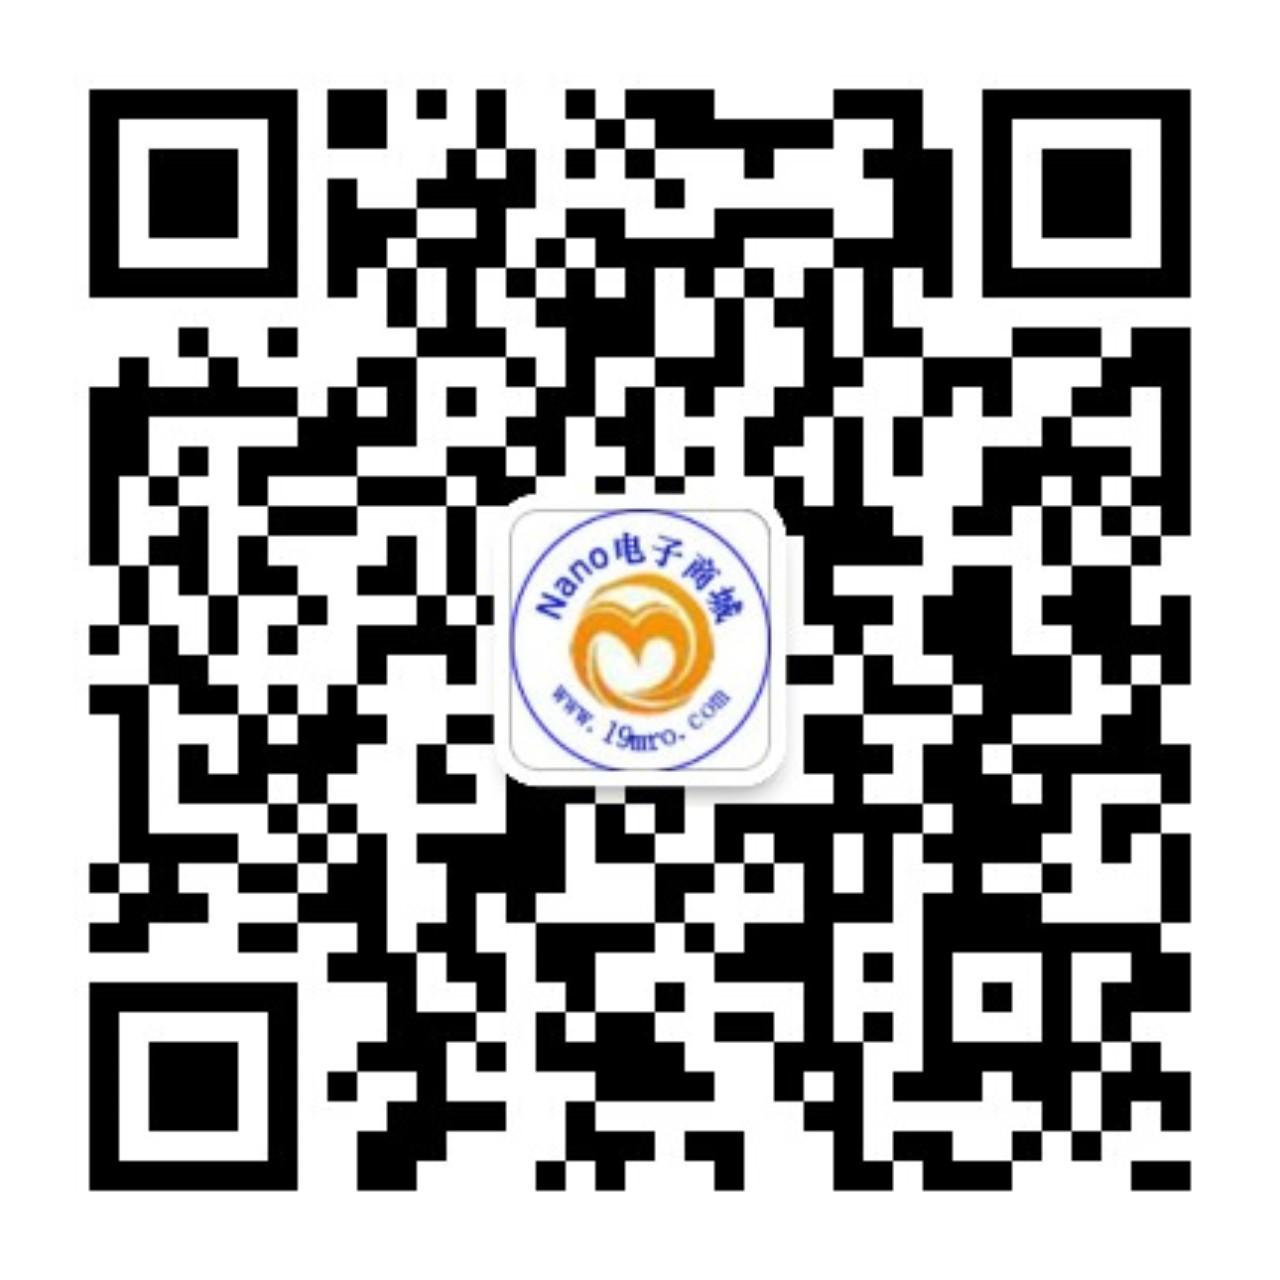 Nano电子商城微信公众号二维码